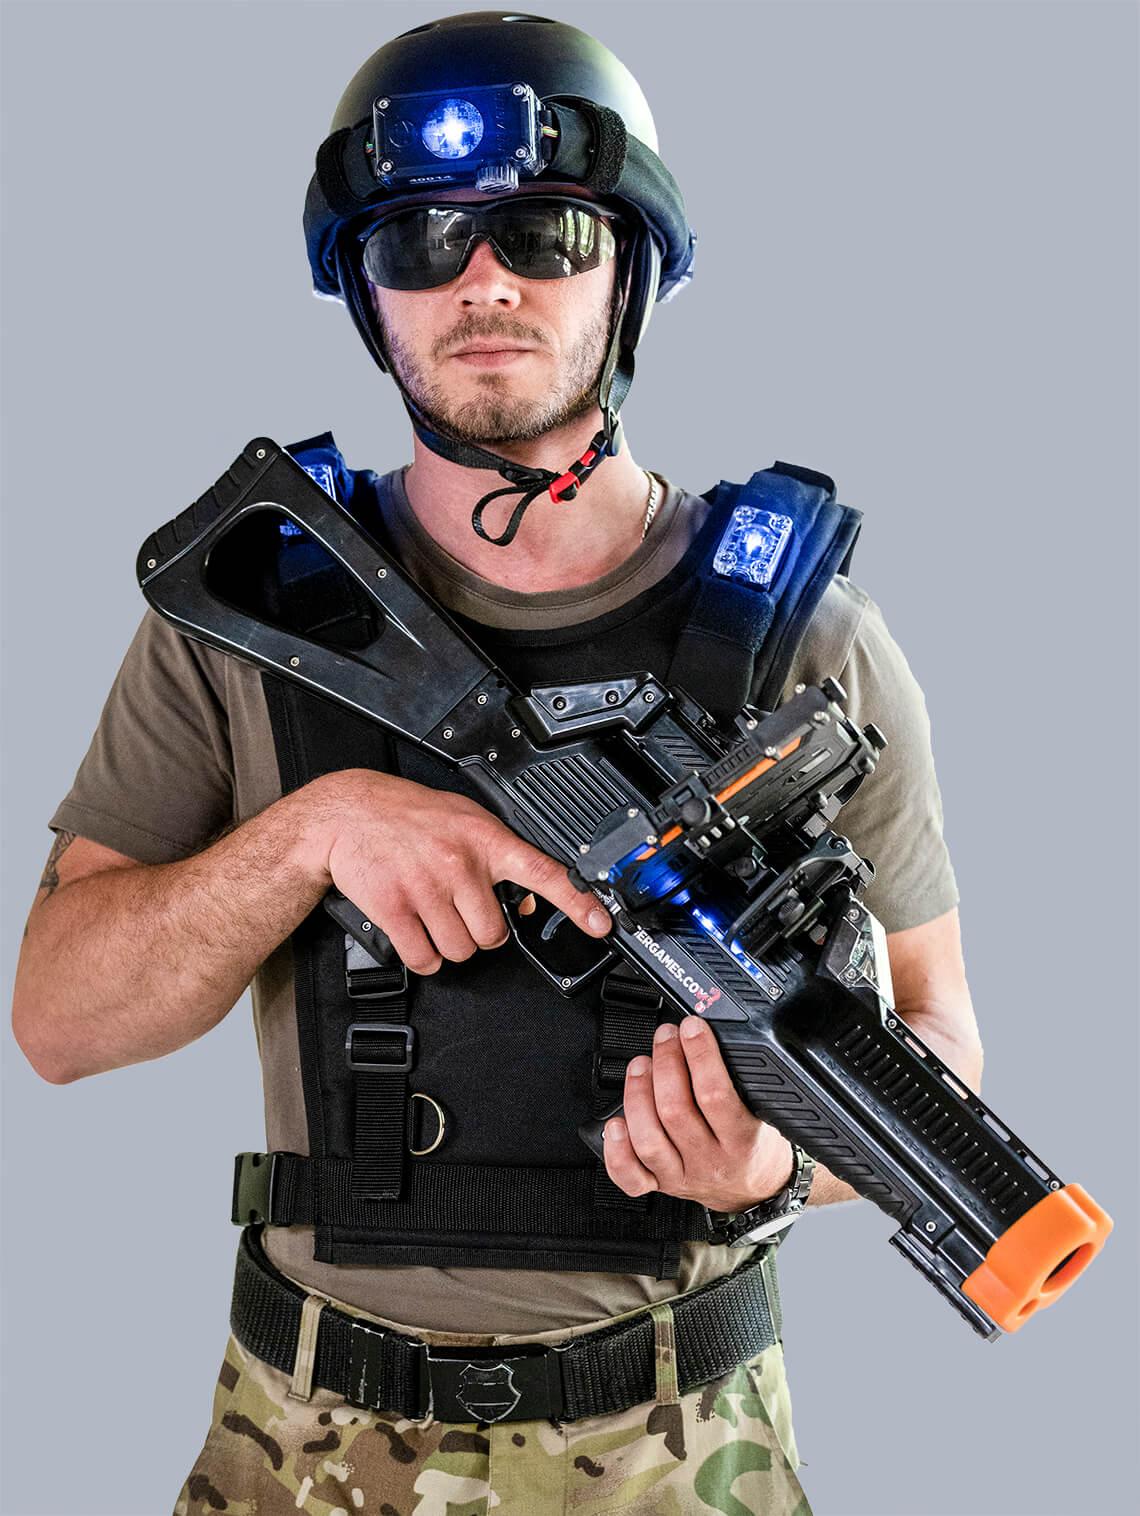 Profesionele lasergameset met vest